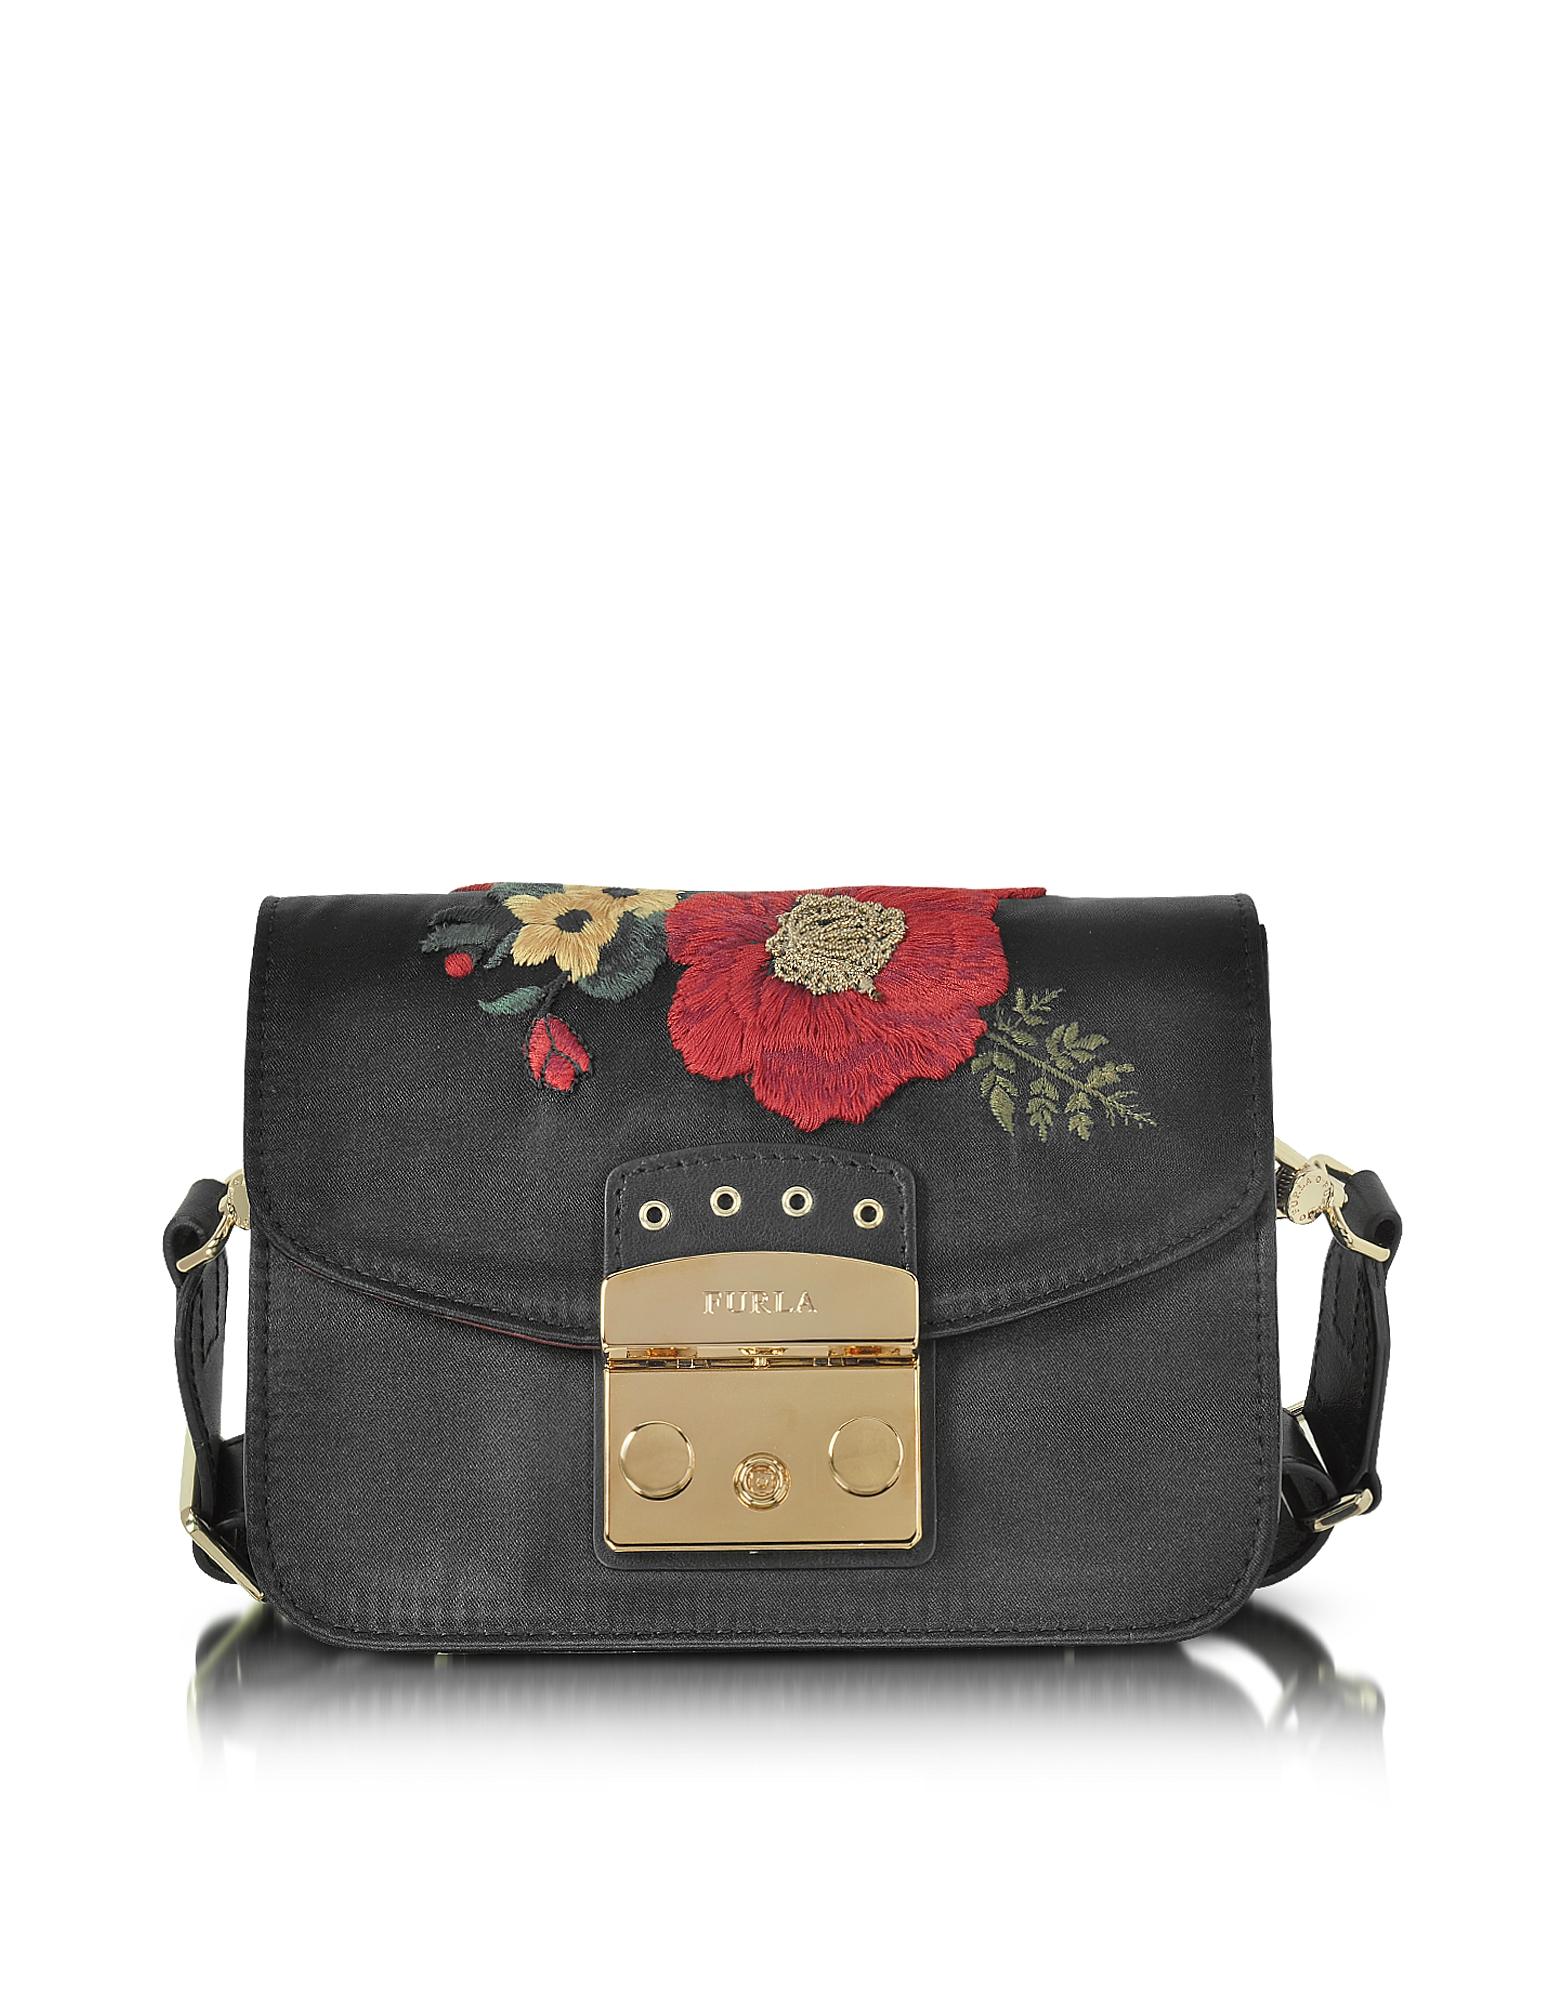 Furla Handbags, Onyx Embroidered Satin Metropolis Floral Mini Crossbody Bag